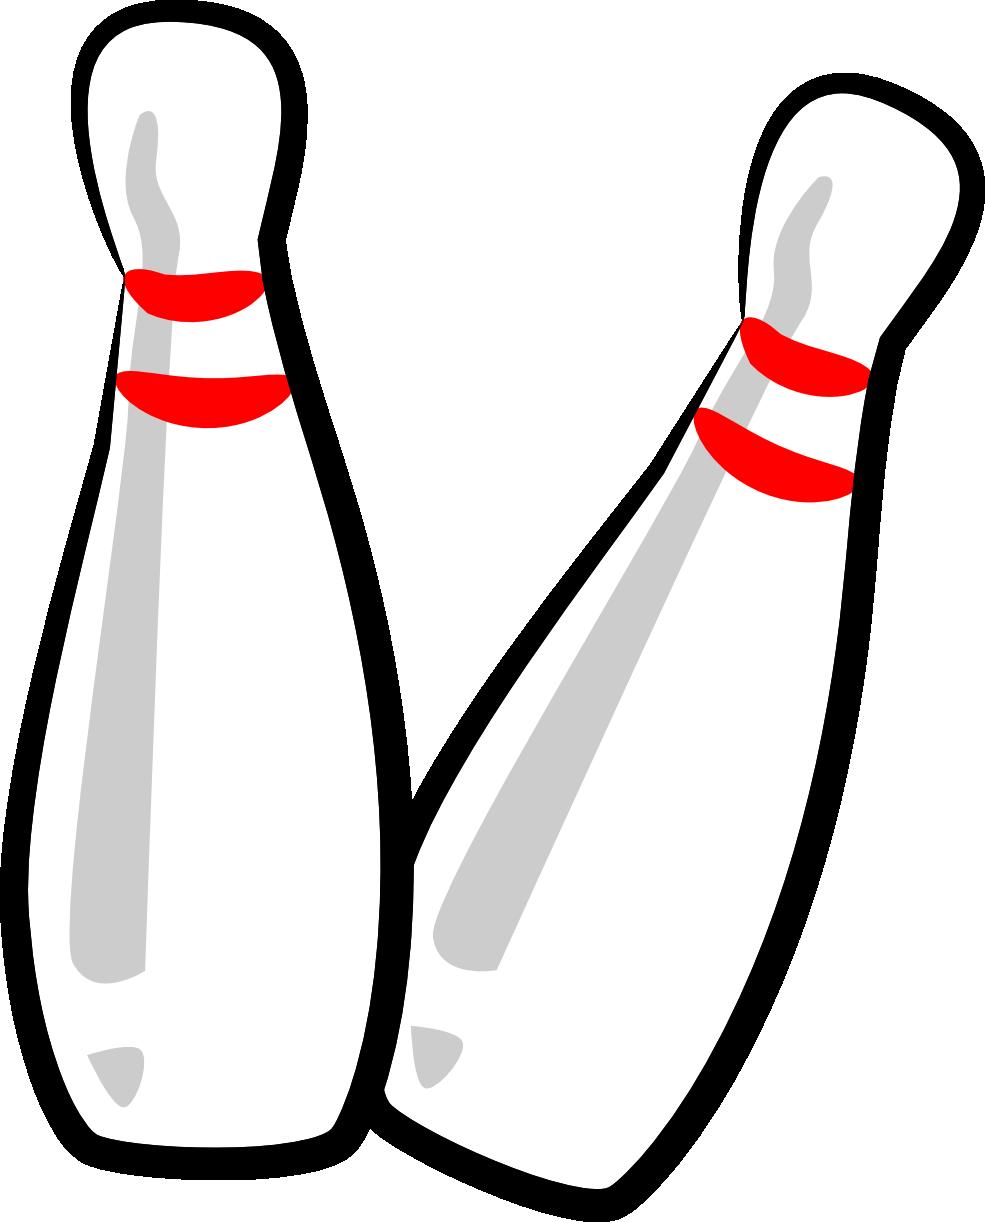 985x1222 Bowling Ball Free Bowling Clip Art Images Image